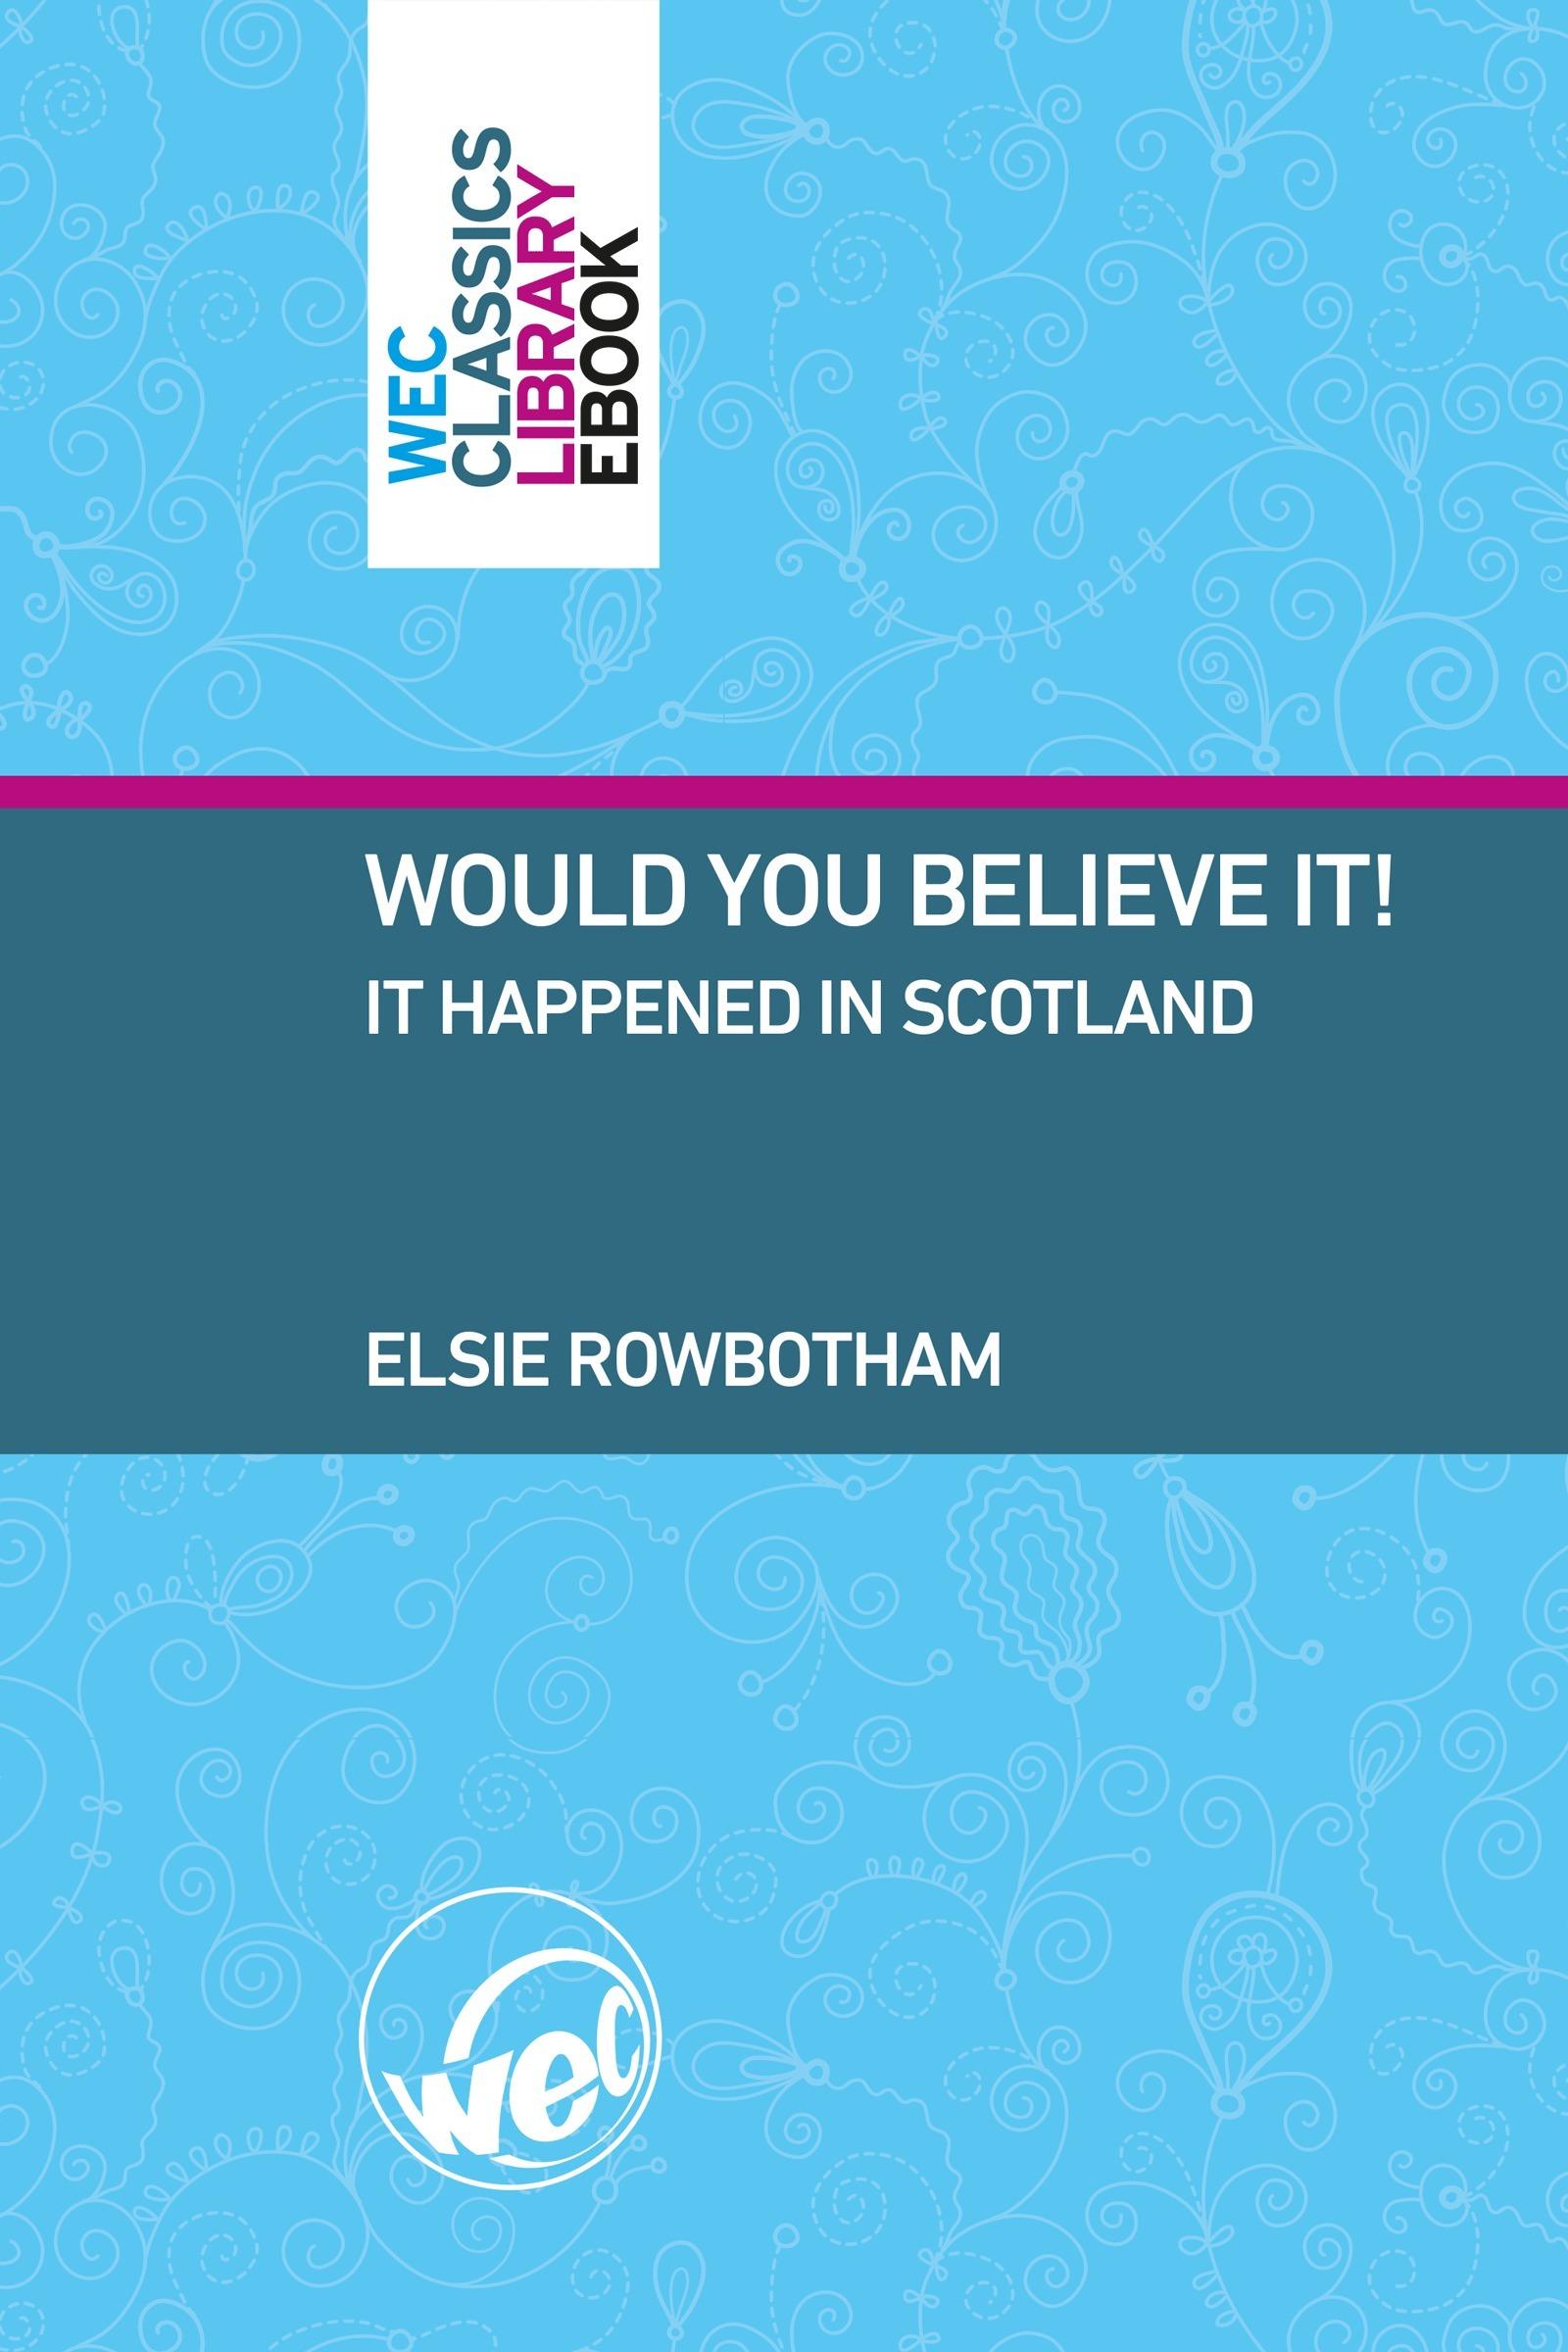 Would You Believe It!, It happened in Scotland Elsie Rowbotham